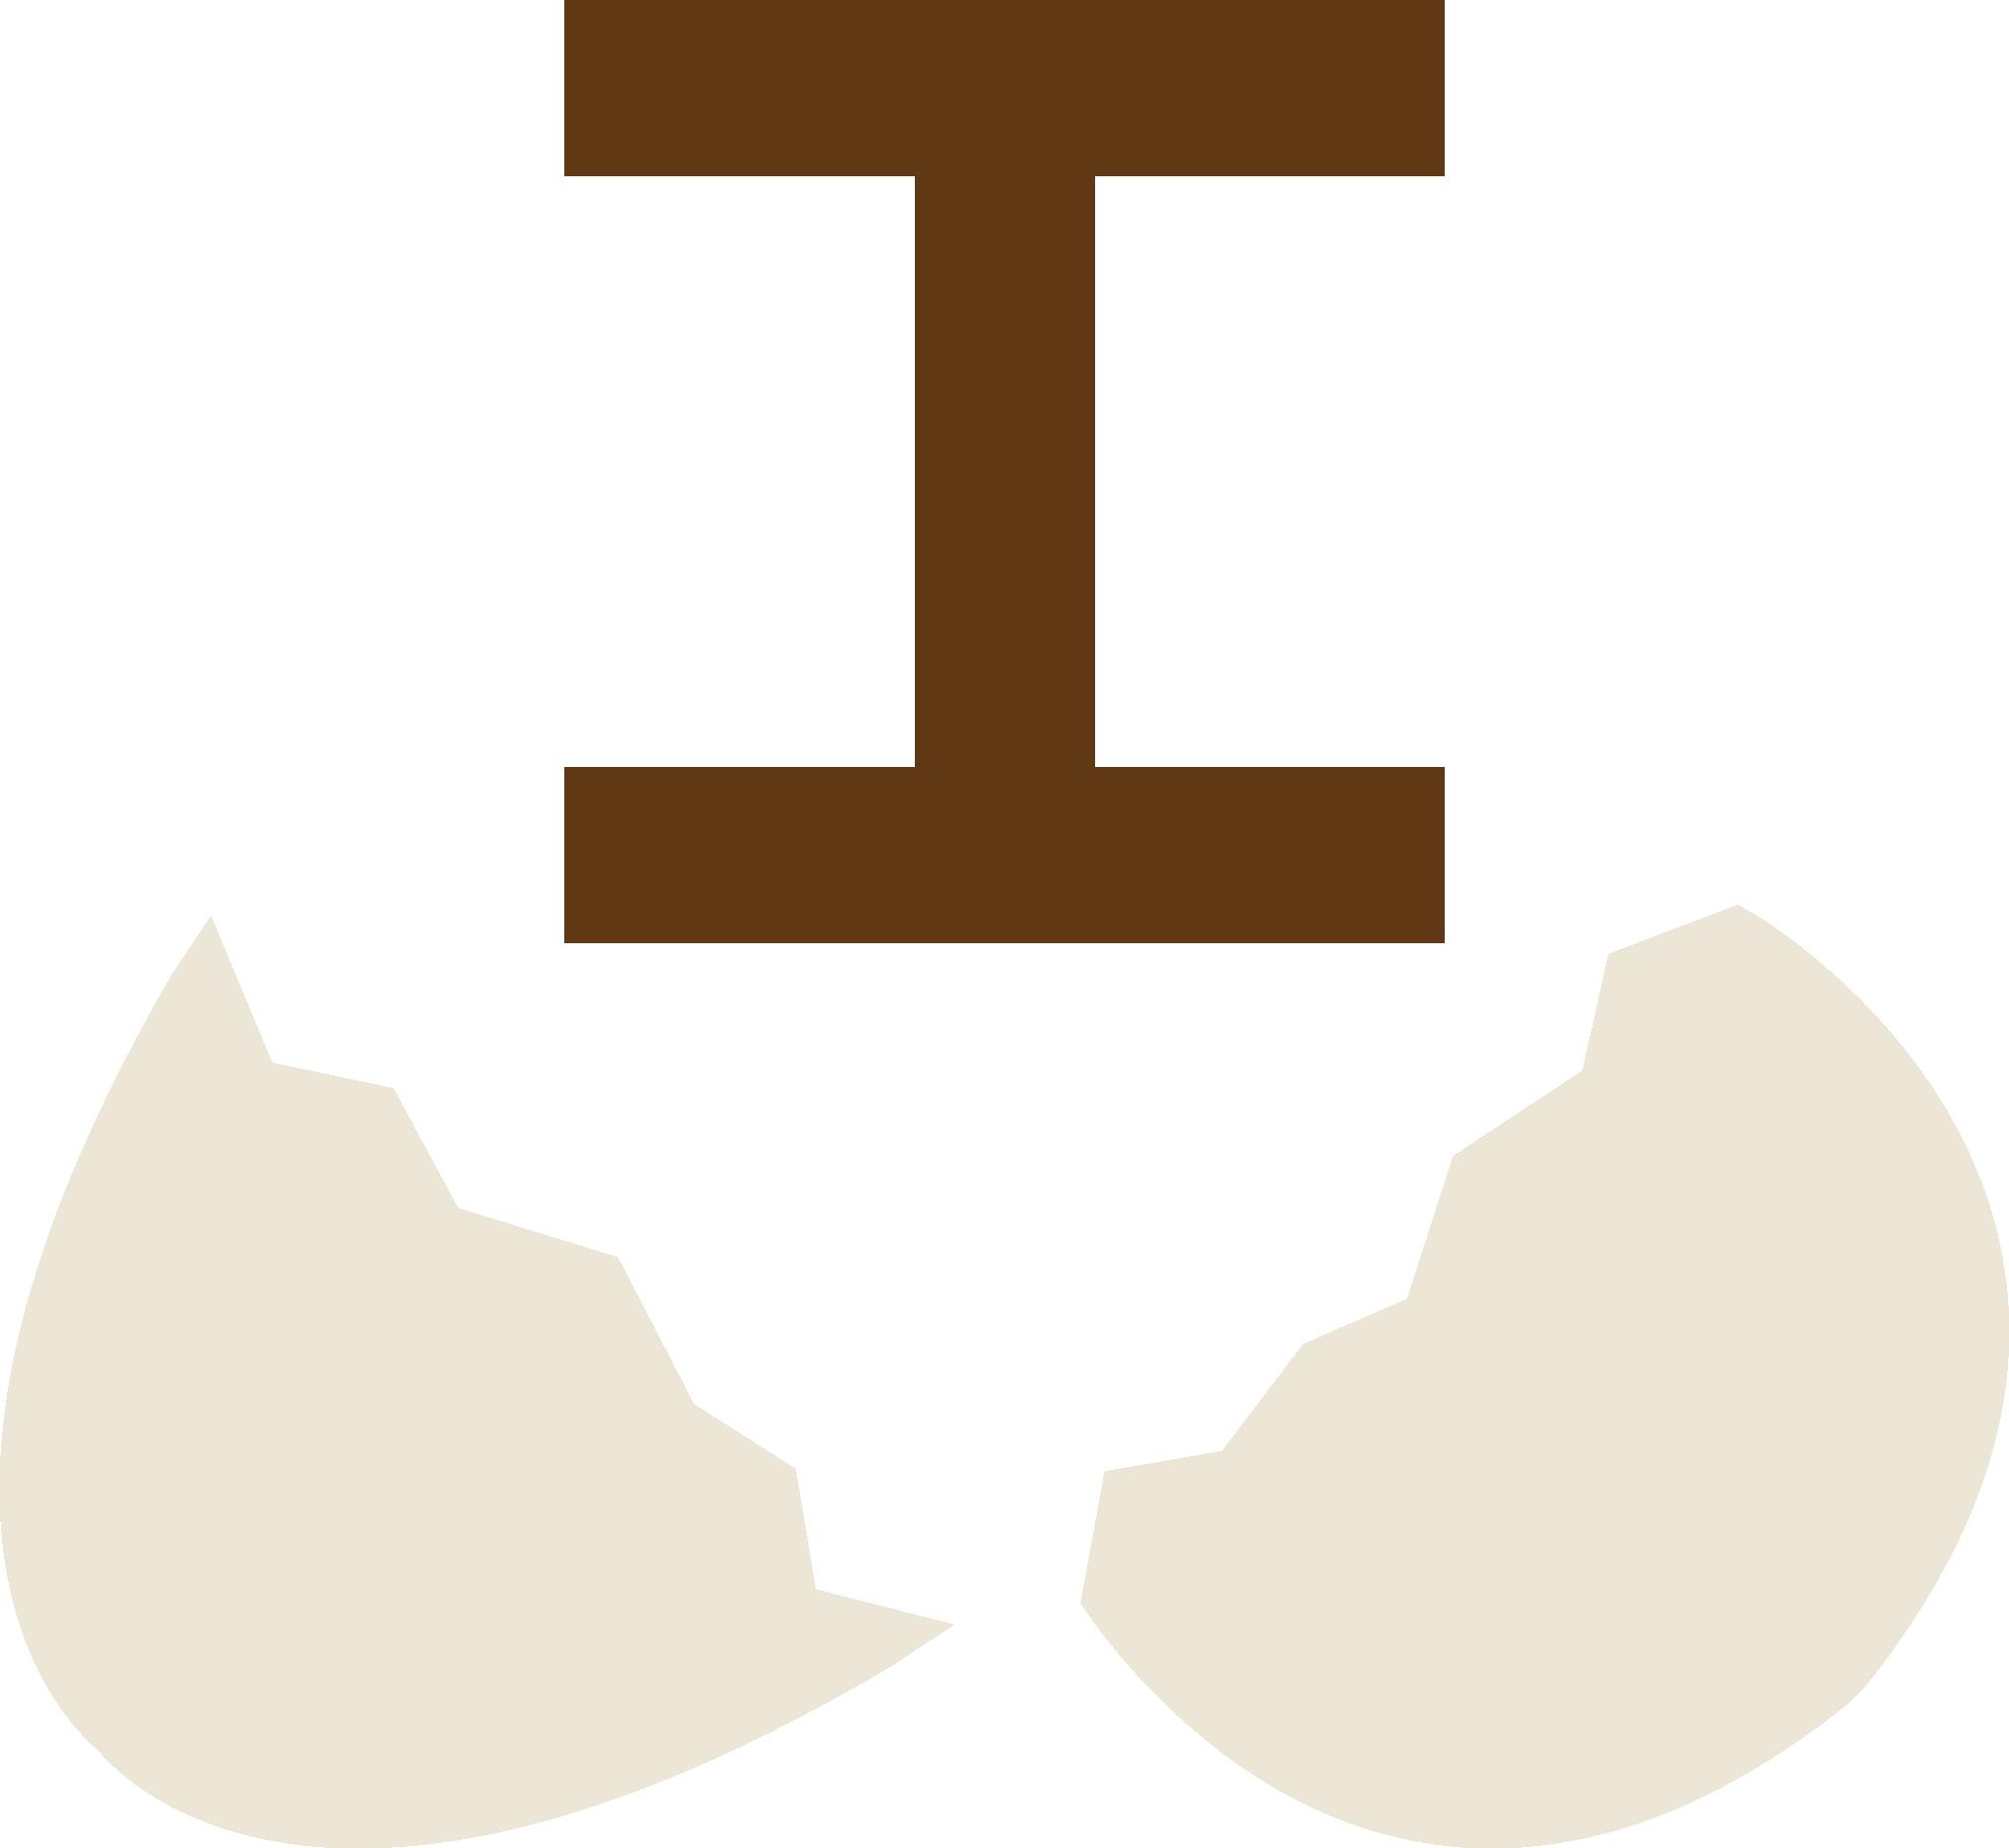 Broken Shell Logo_Brown.png